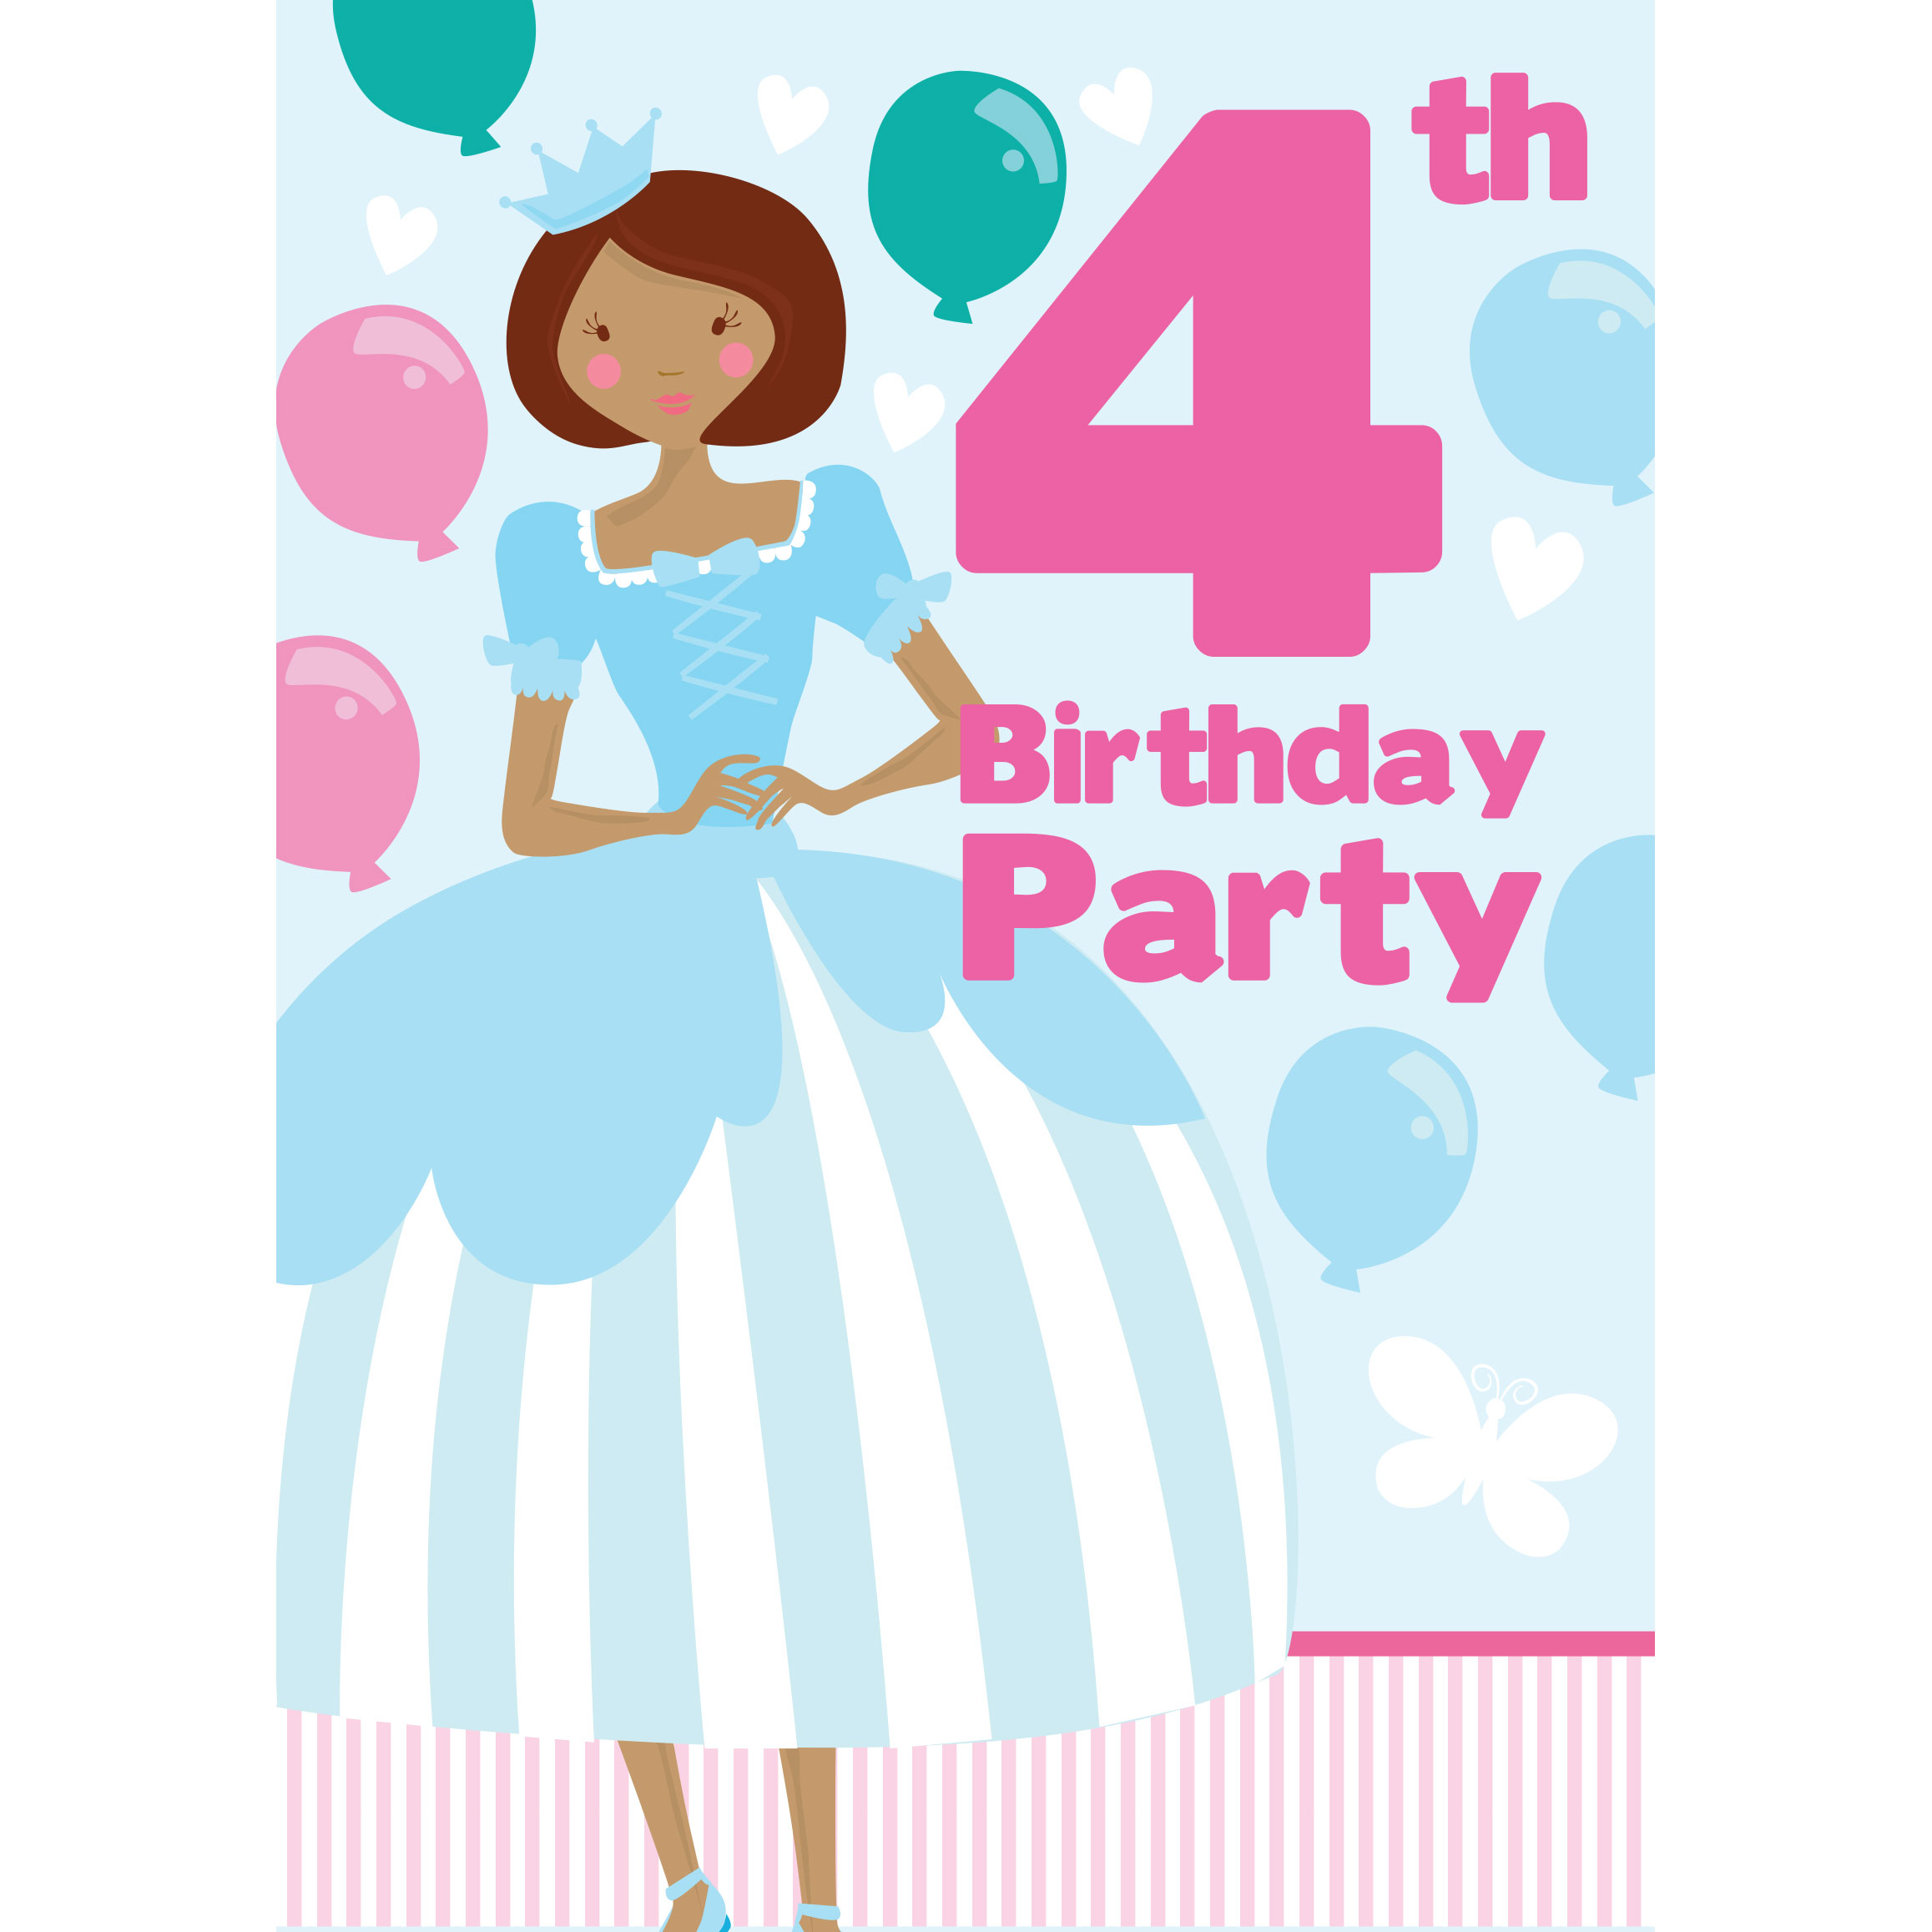 4th Birthday Party Invites